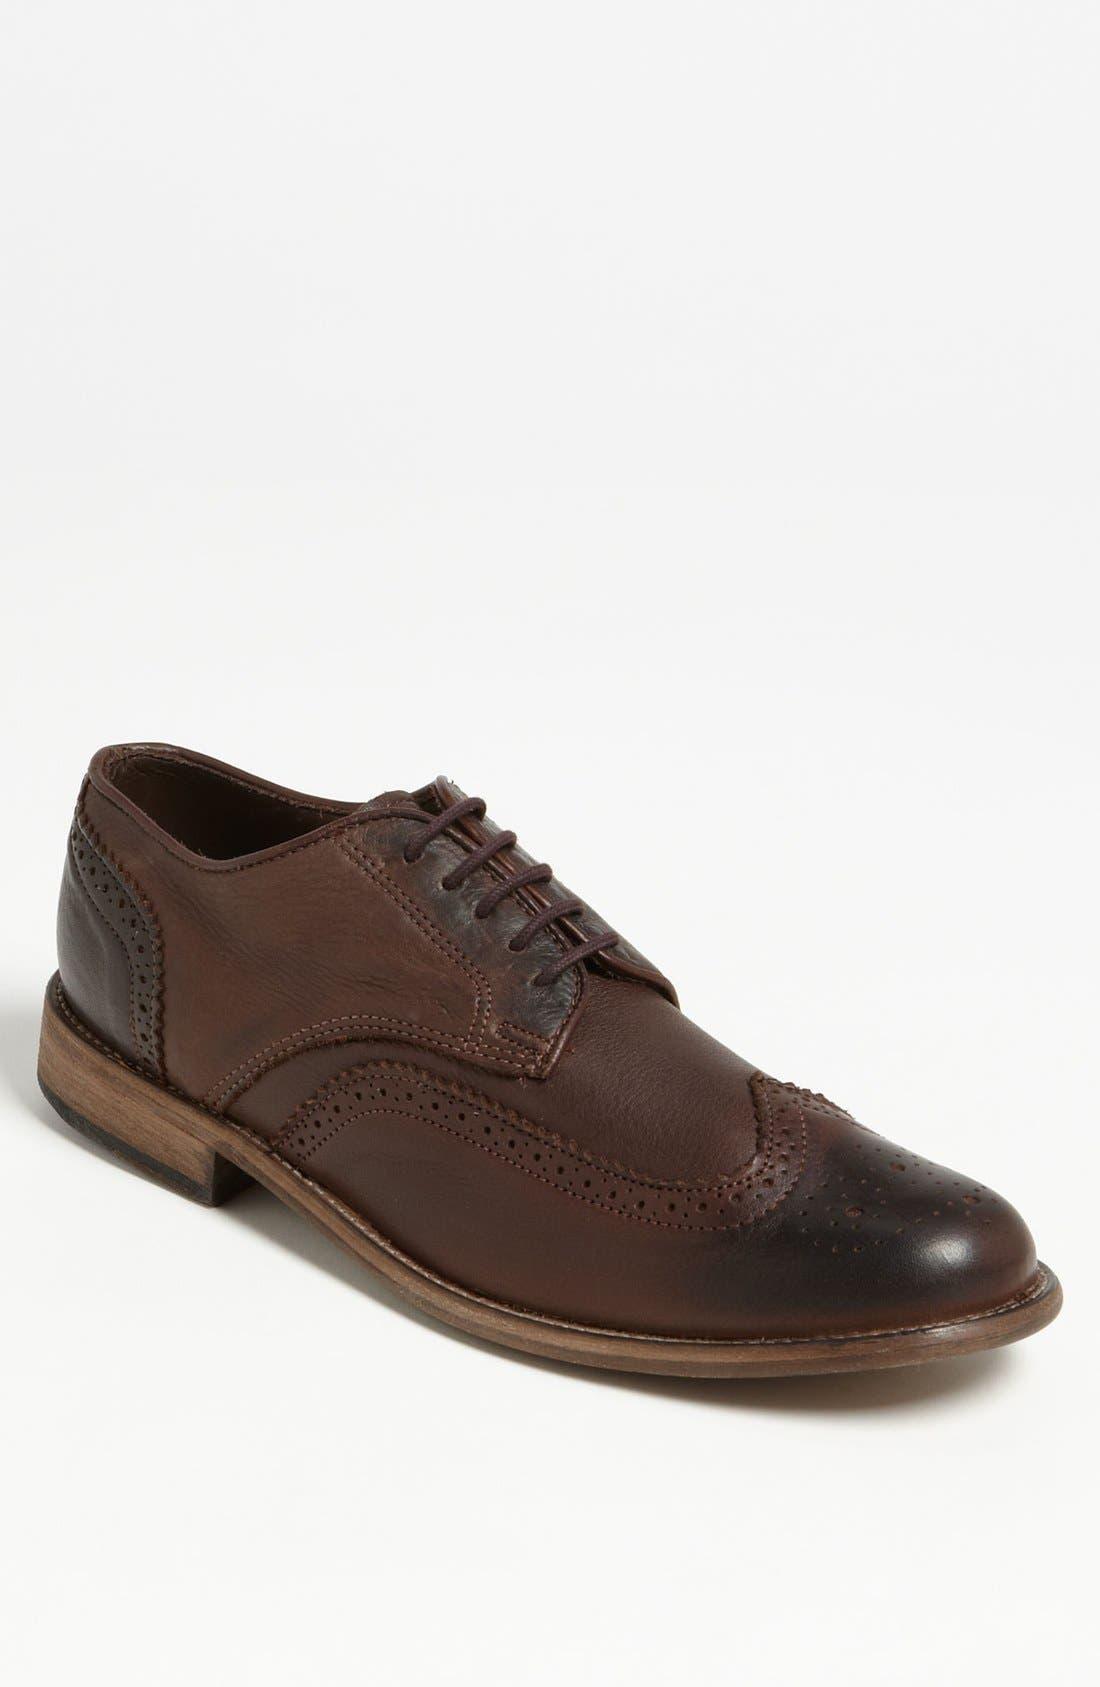 Main Image - Vintage Shoe Company 'Warren' Wingtip